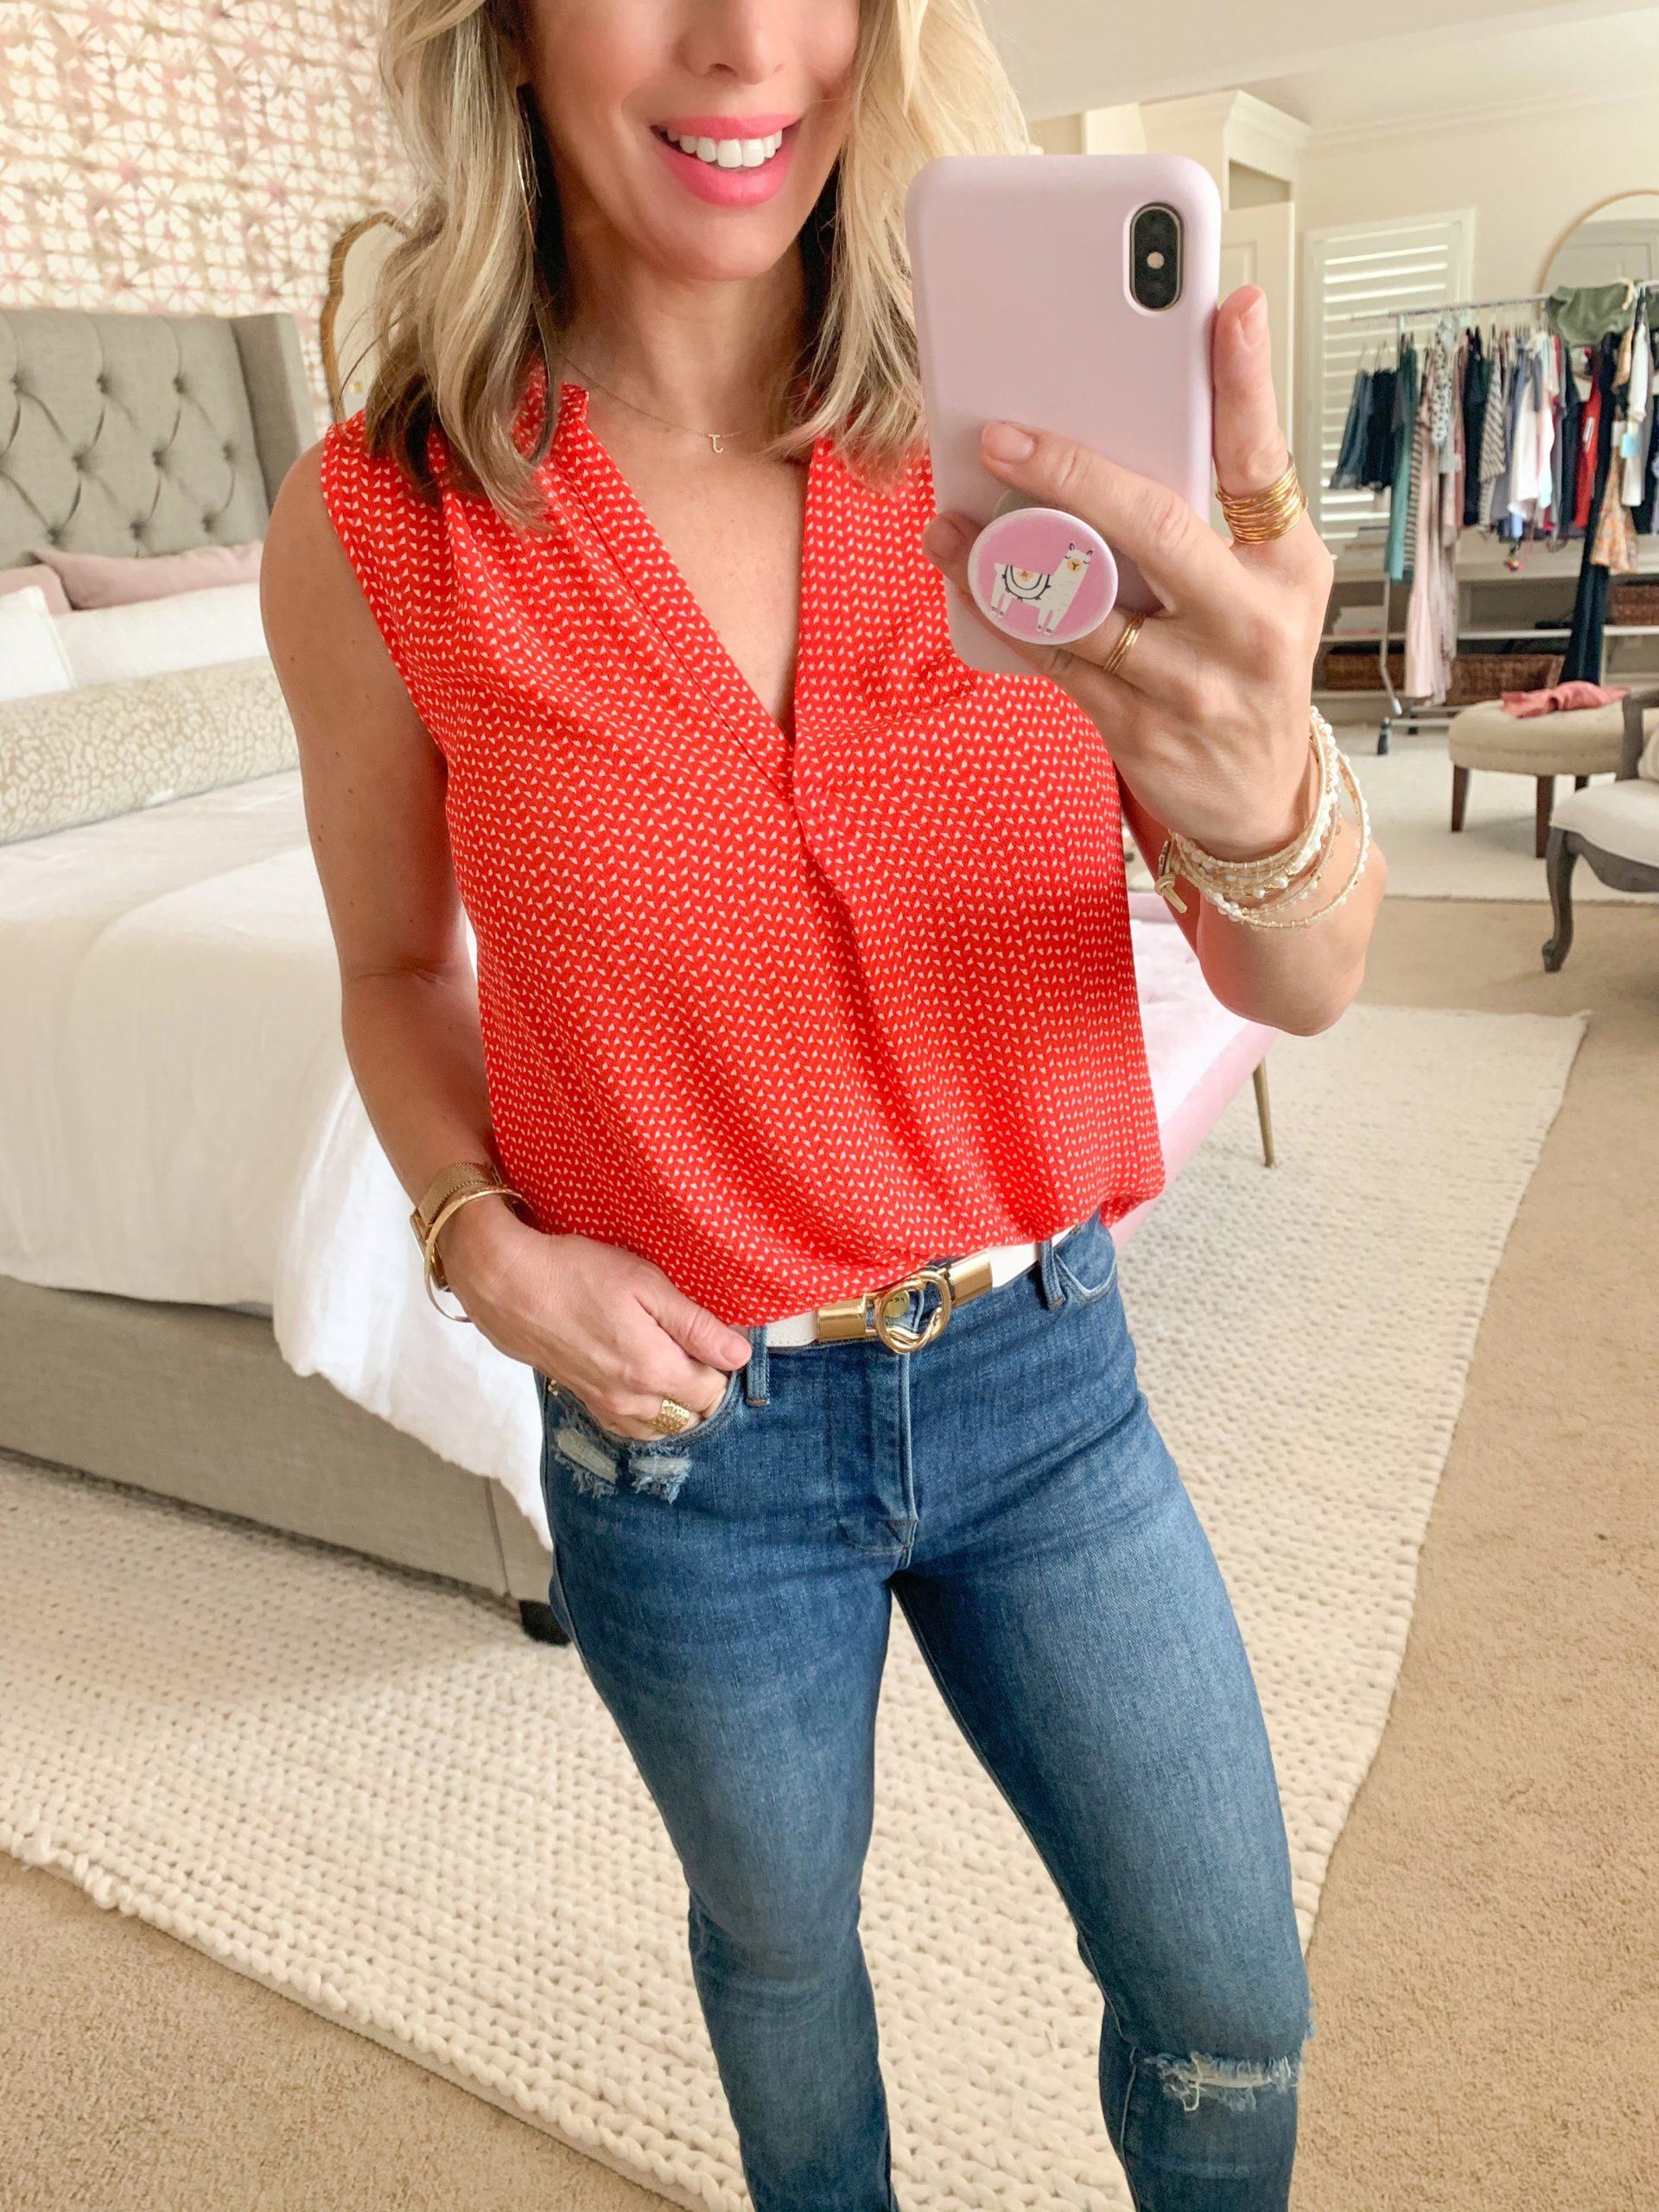 Summer Outfit, Nordstrom, Vince Camuto Sleeveless Blouse, Frame Denim Jeans, White/Gold Belt